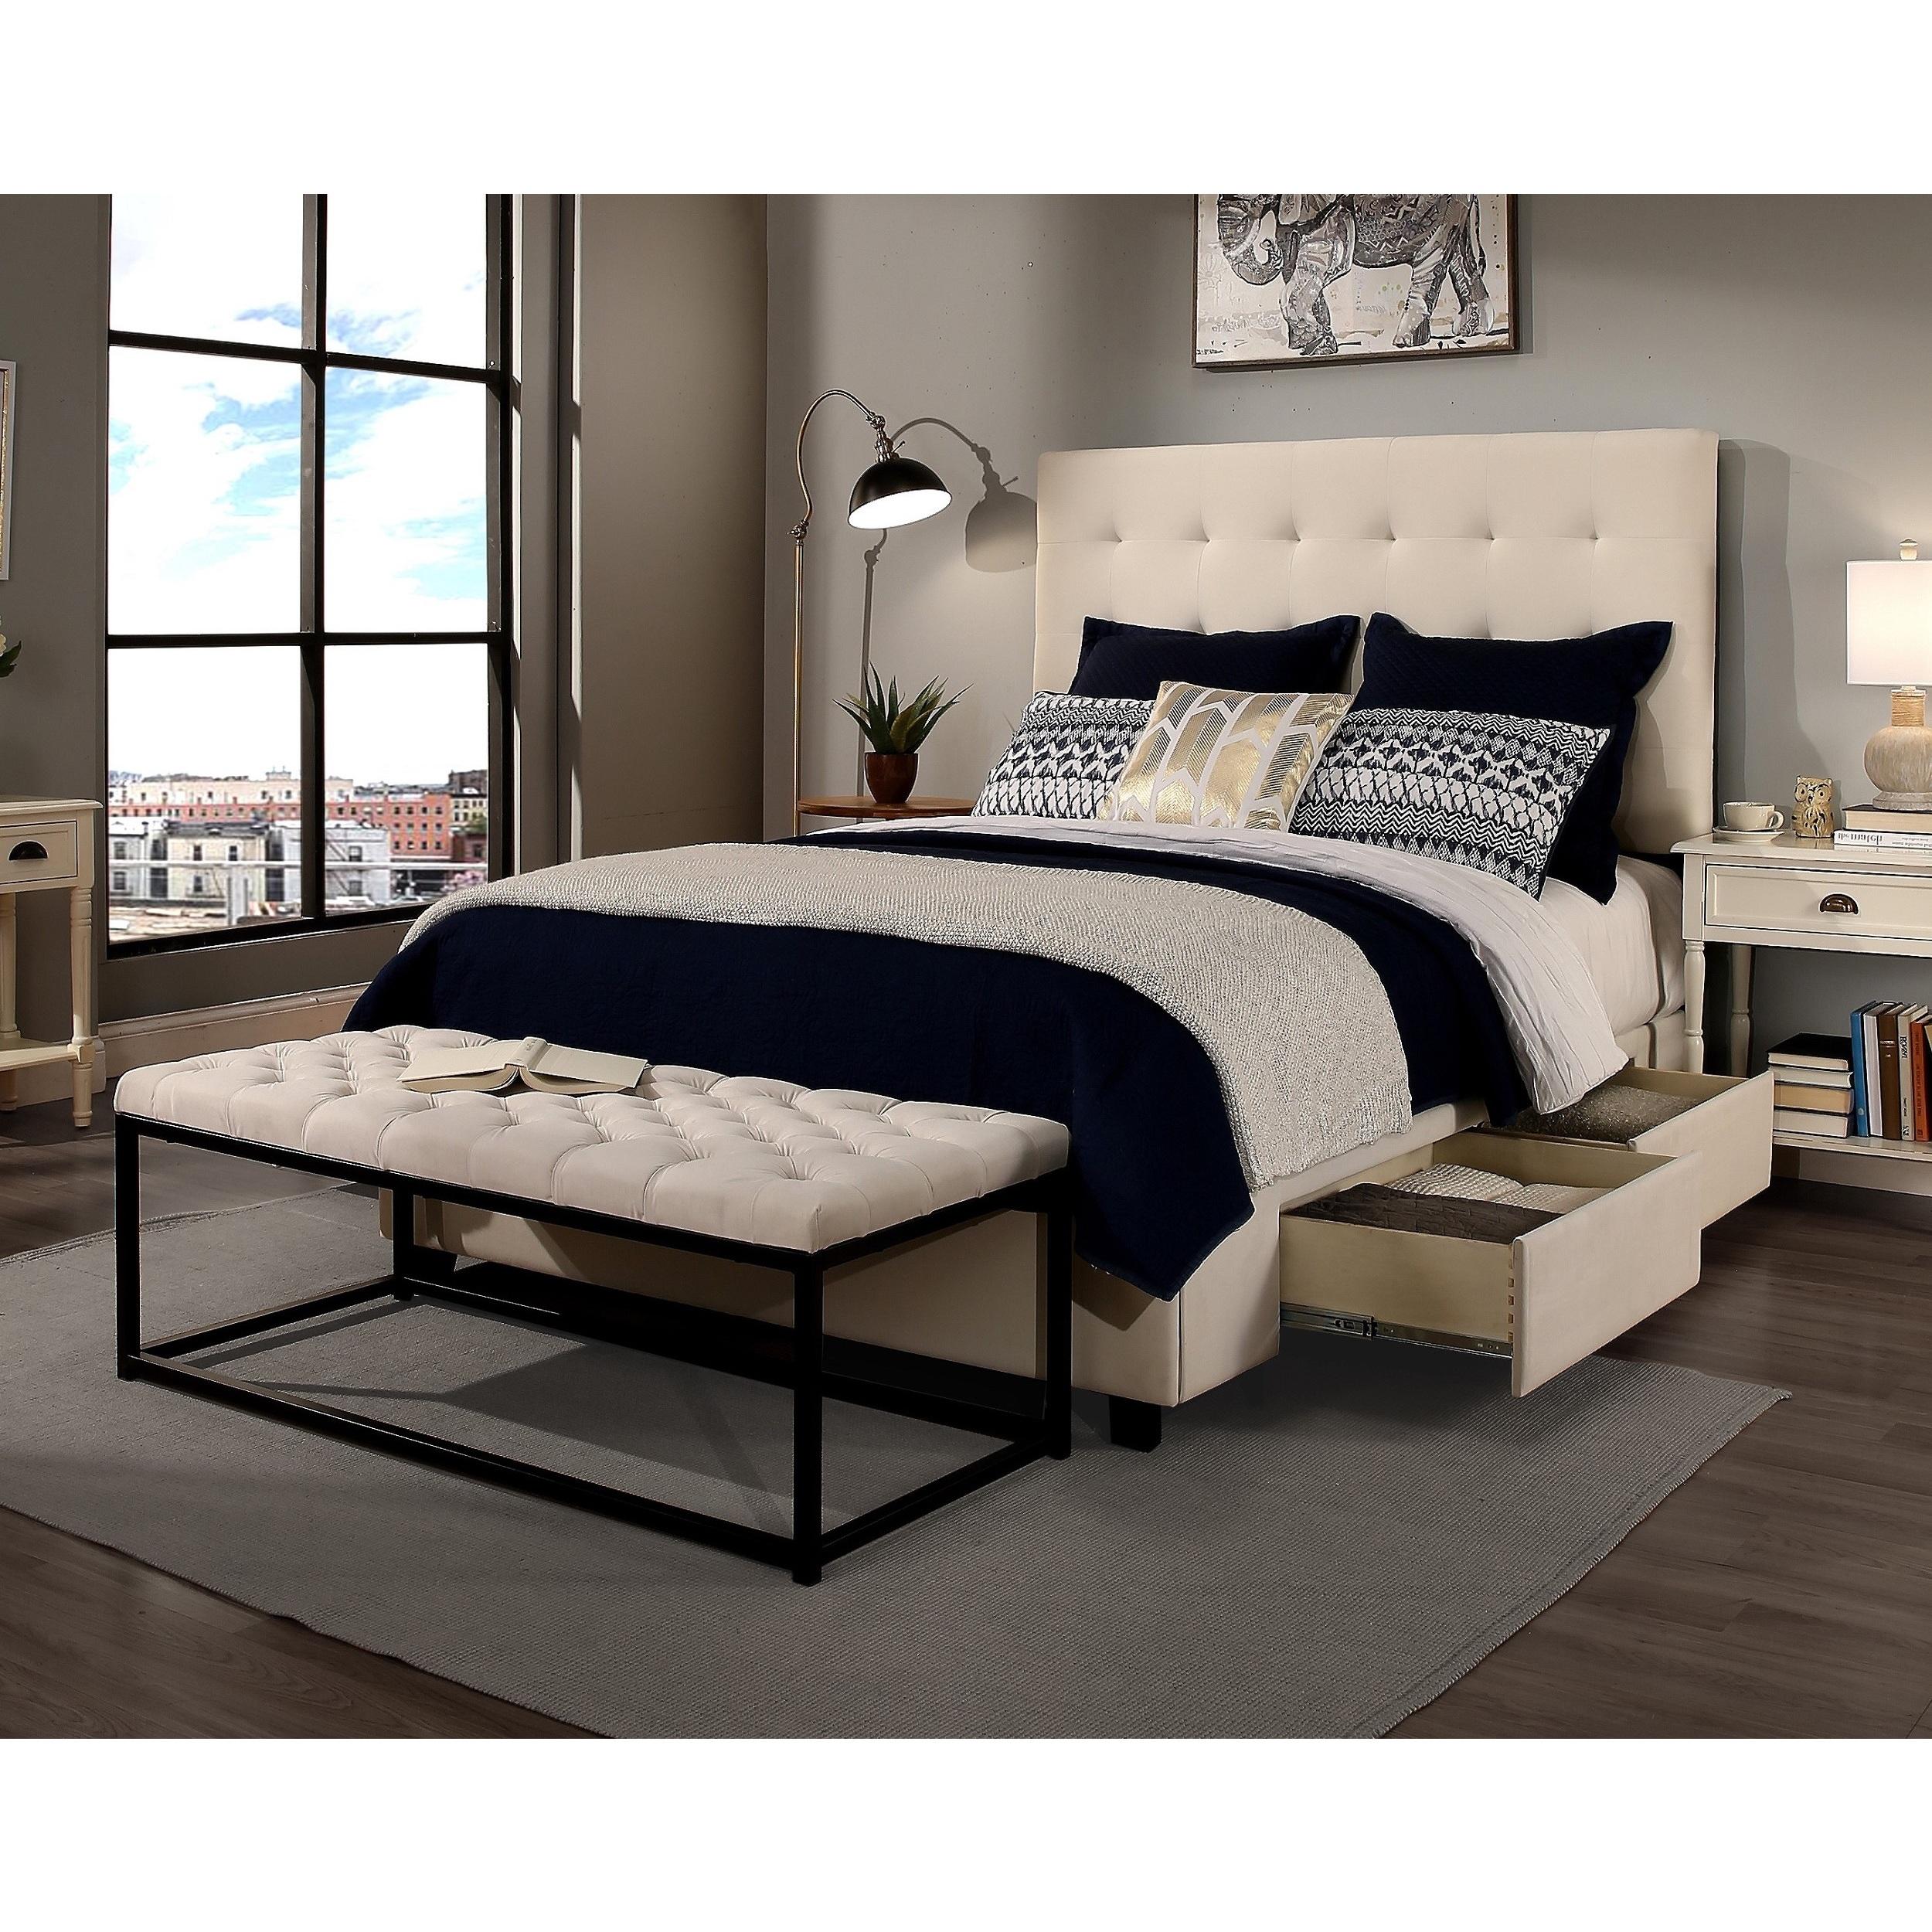 Republic Design House Manhattan King-size Ivory Tufted Pl...